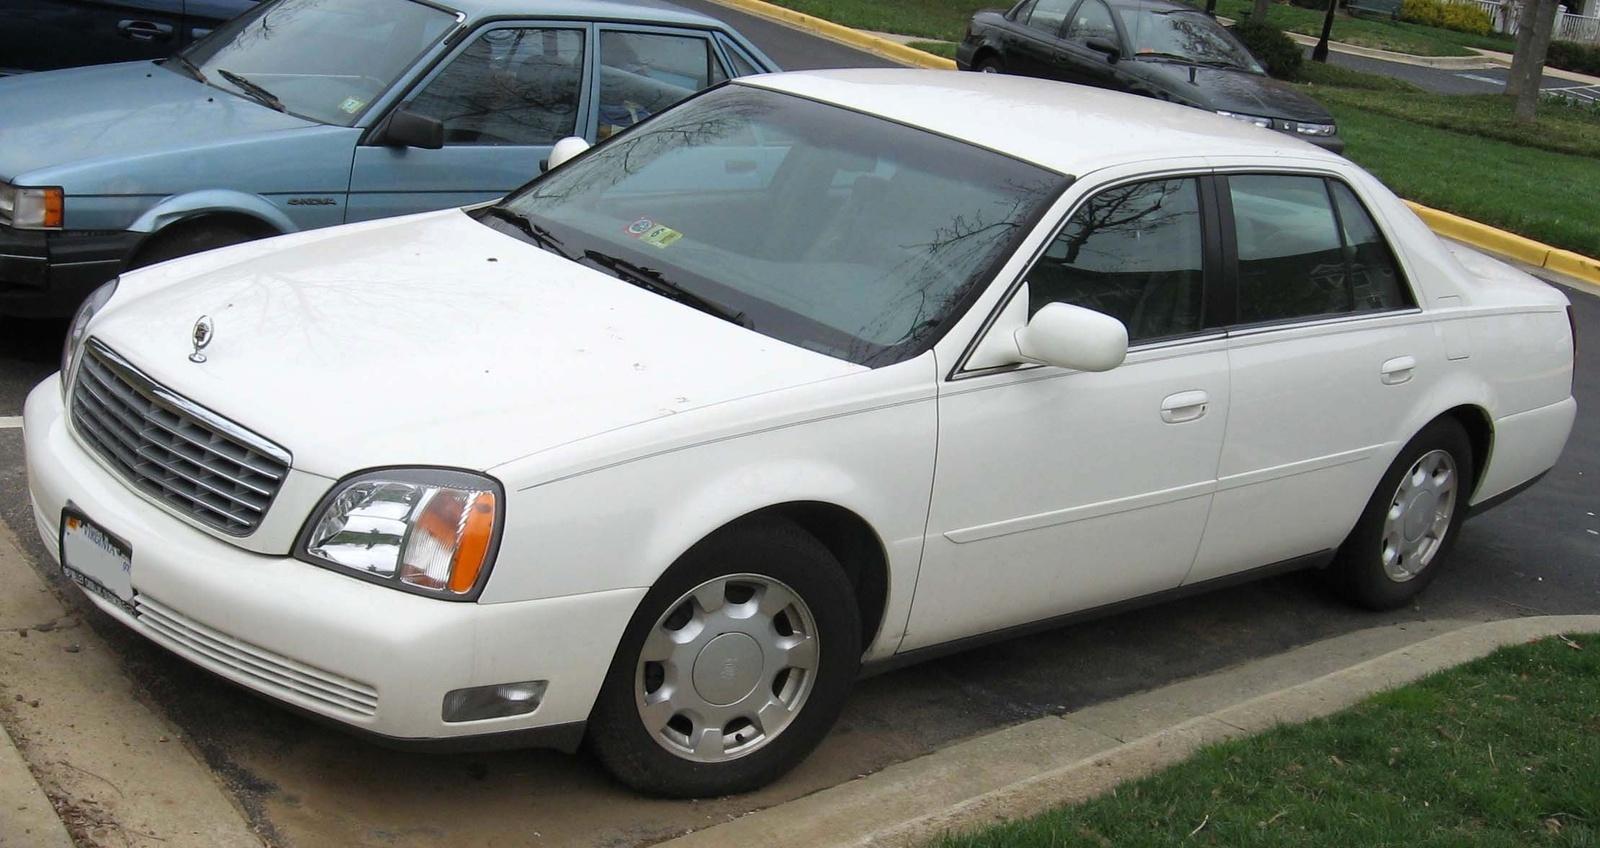 Cadillac Deville Pic X